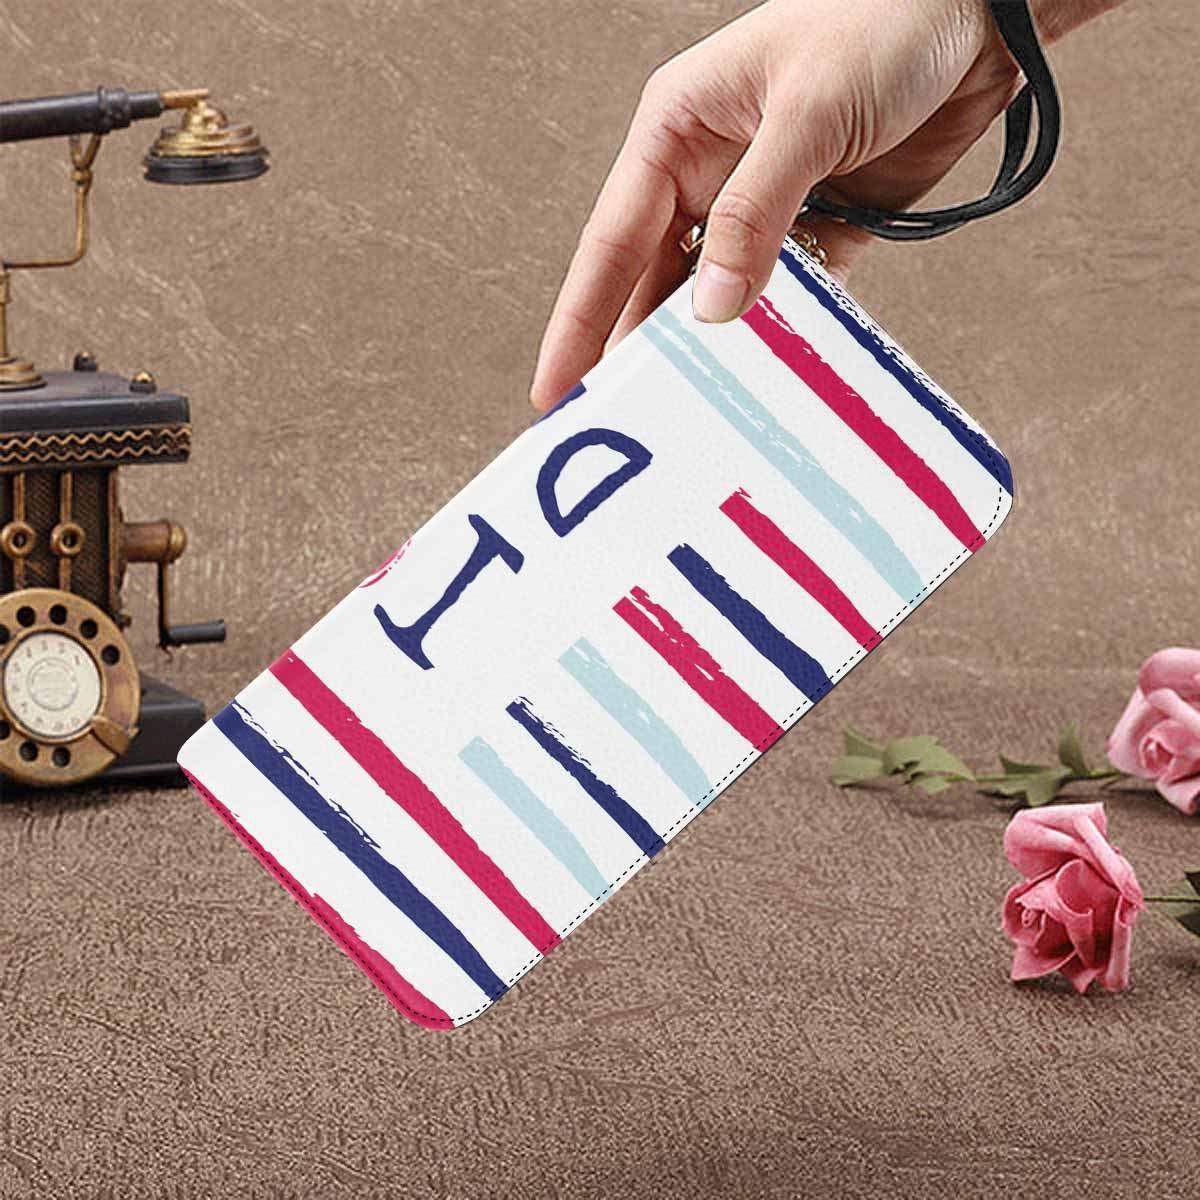 InterestPrint Womens I Love You Dad with a Heart Clutch Purse Card Holder Organizer Ladies Purse